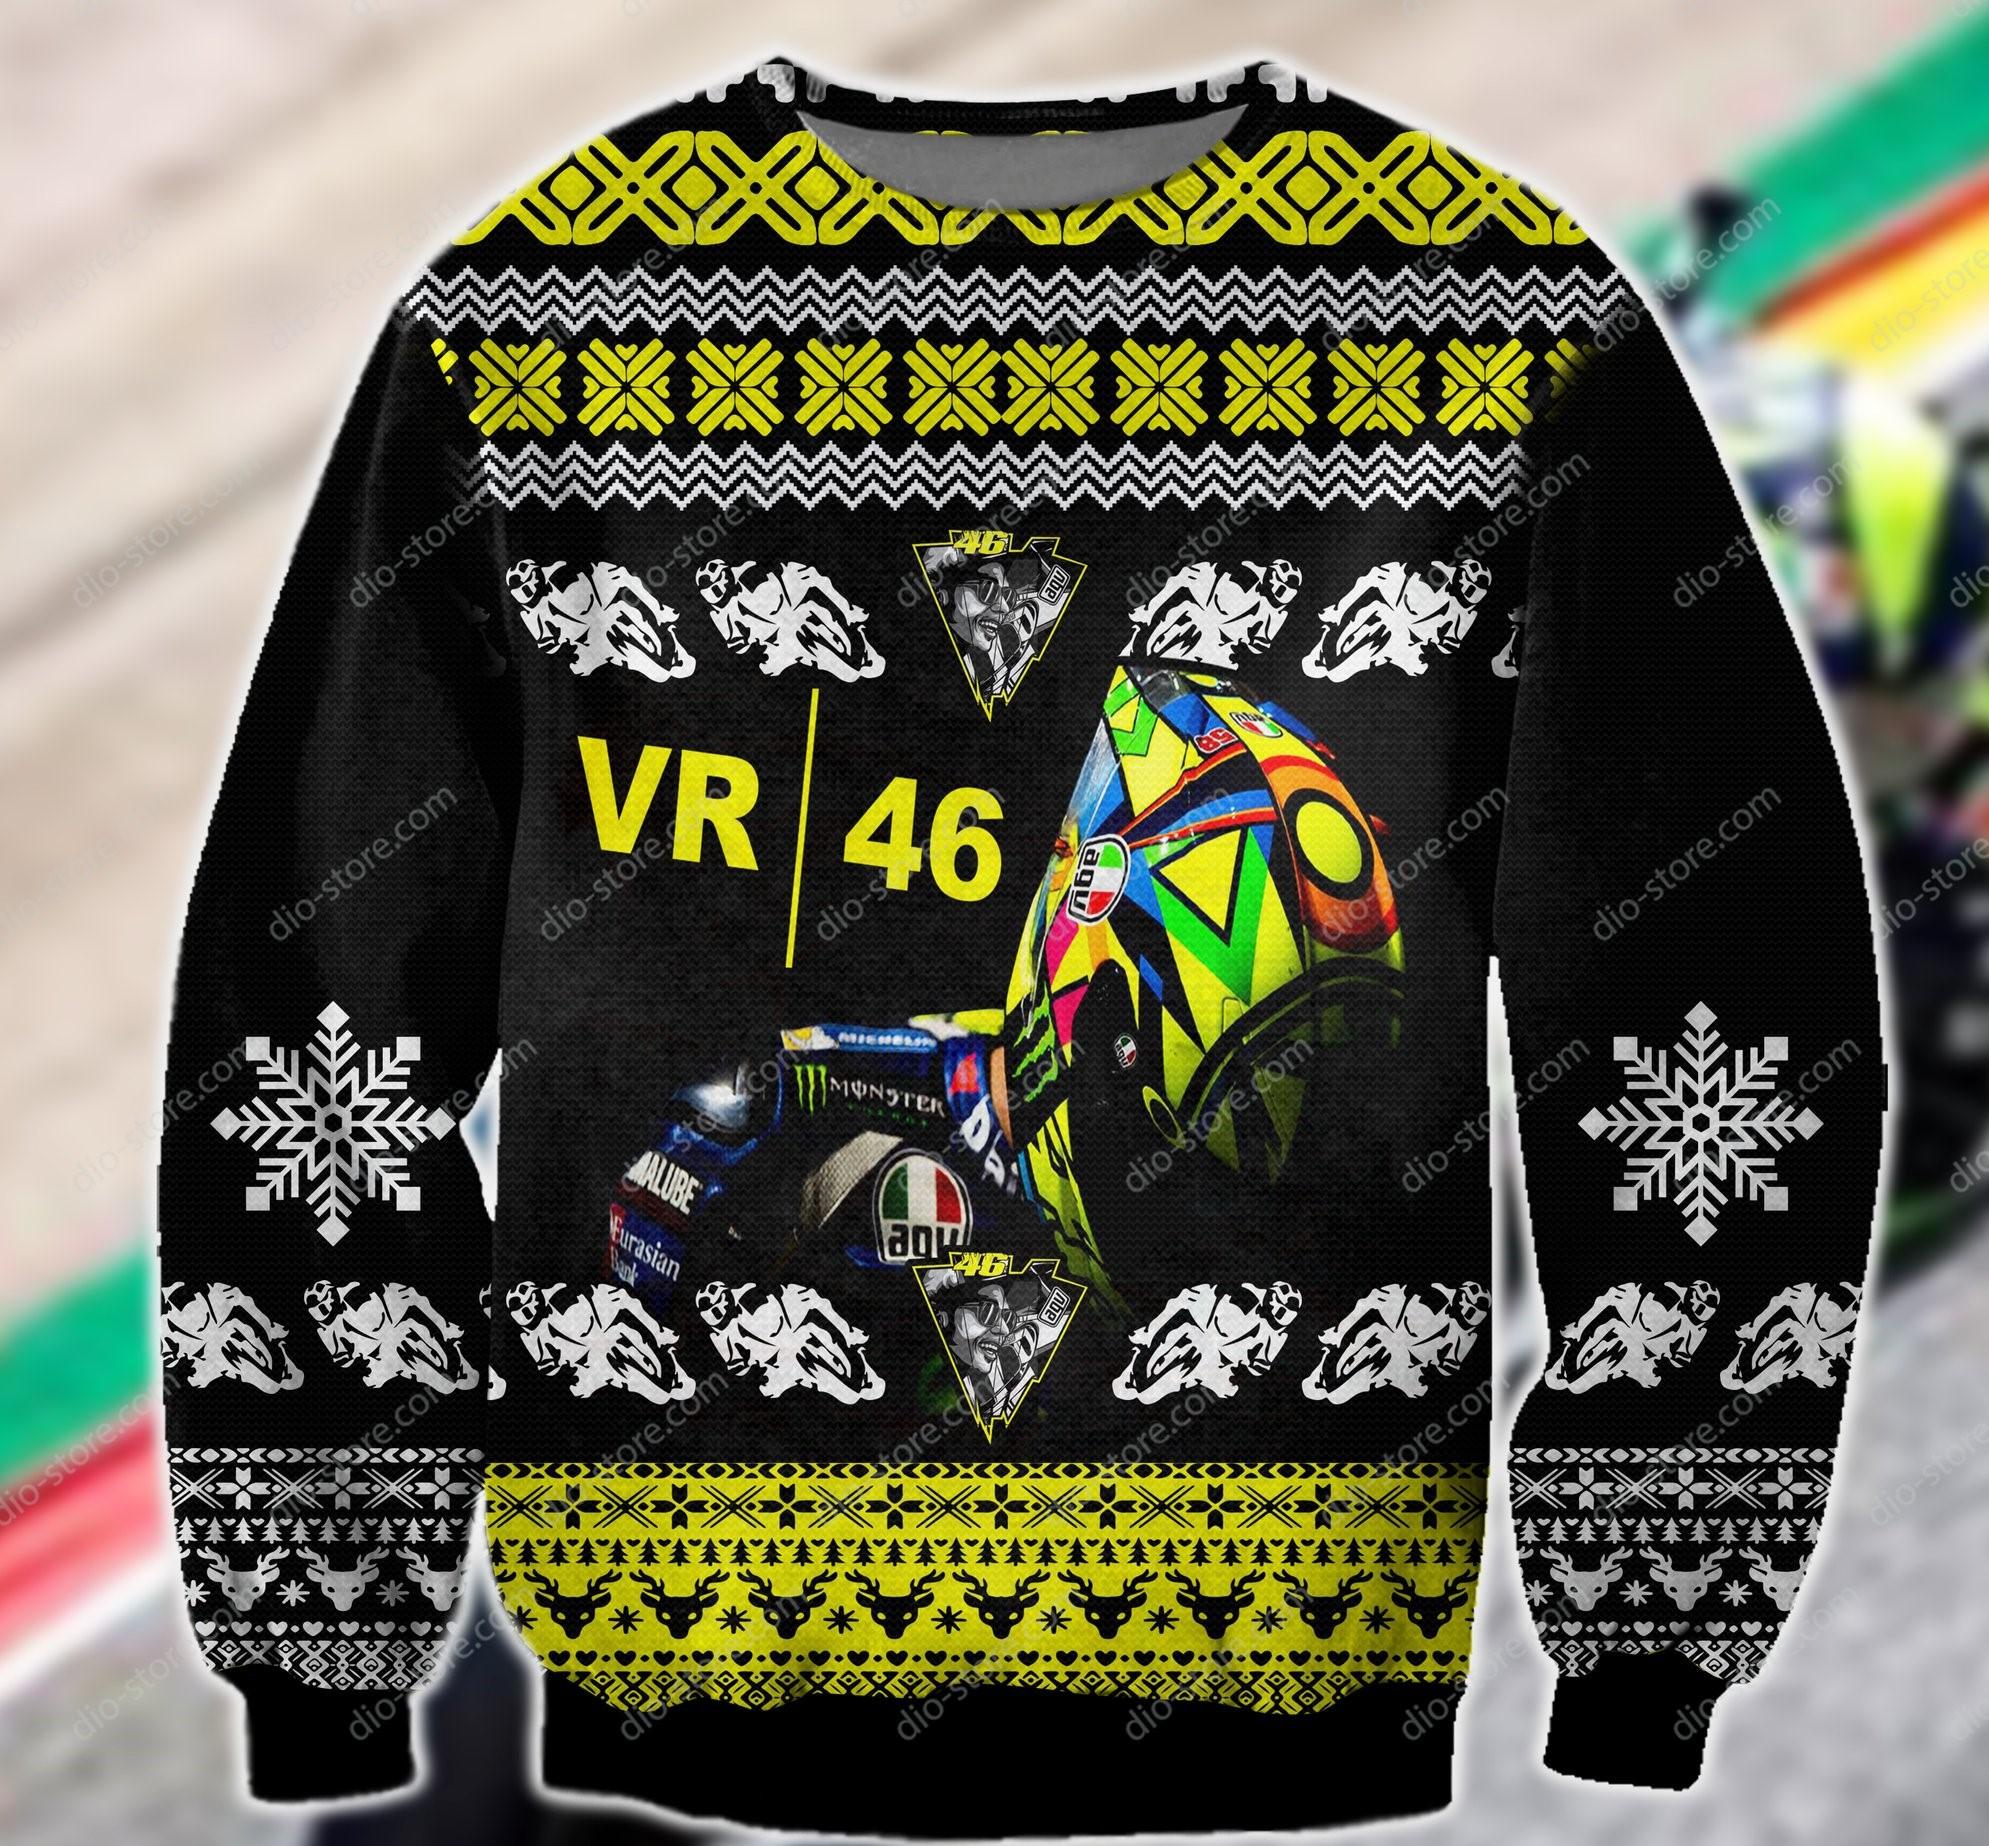 sky racing vr46 all over printed ugly christmas sweater 2 - Copy (3)